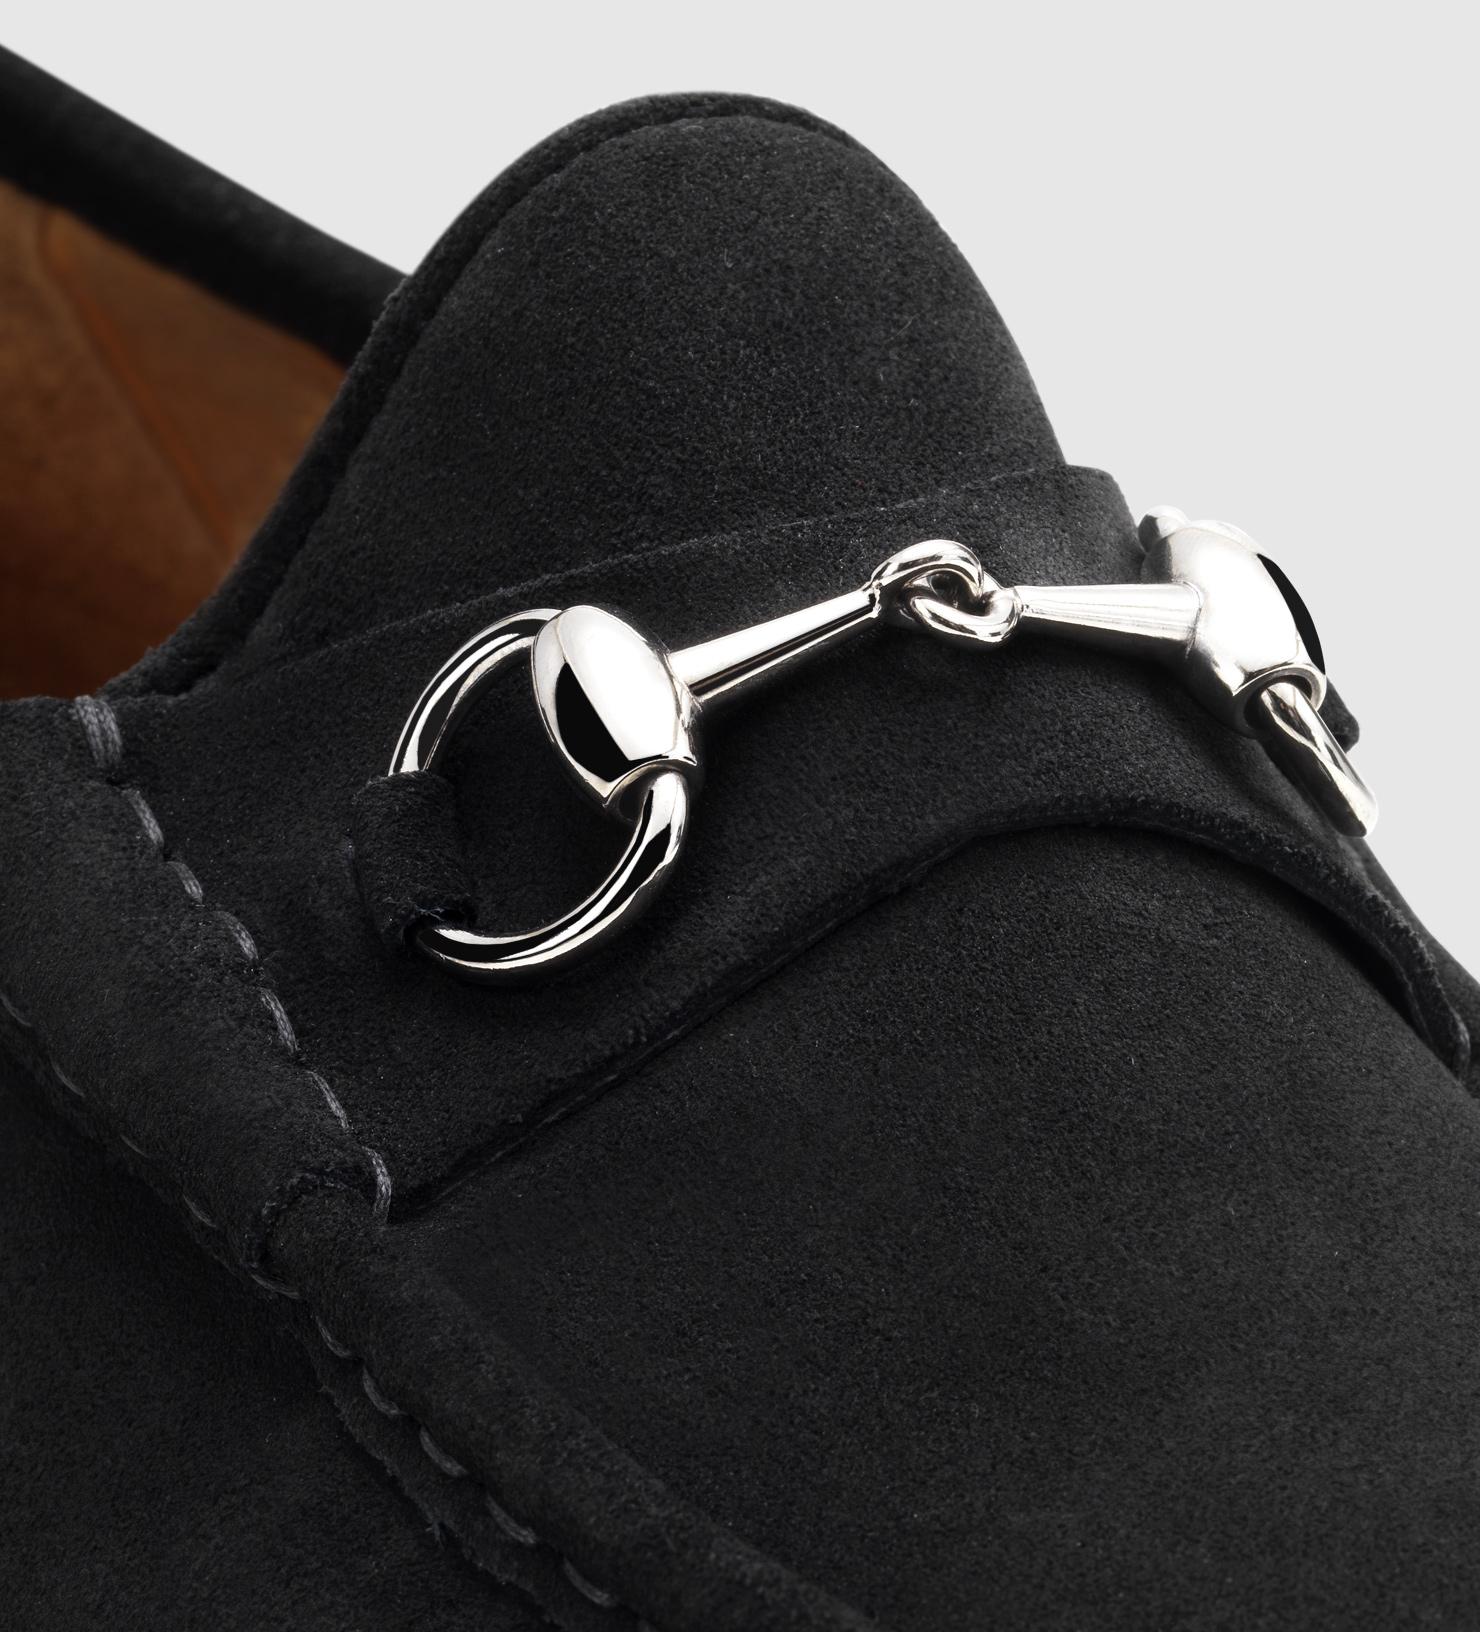 d4de6d81a Gucci Men's Horsebit Loafer In Black Suede in Black for Men - Lyst